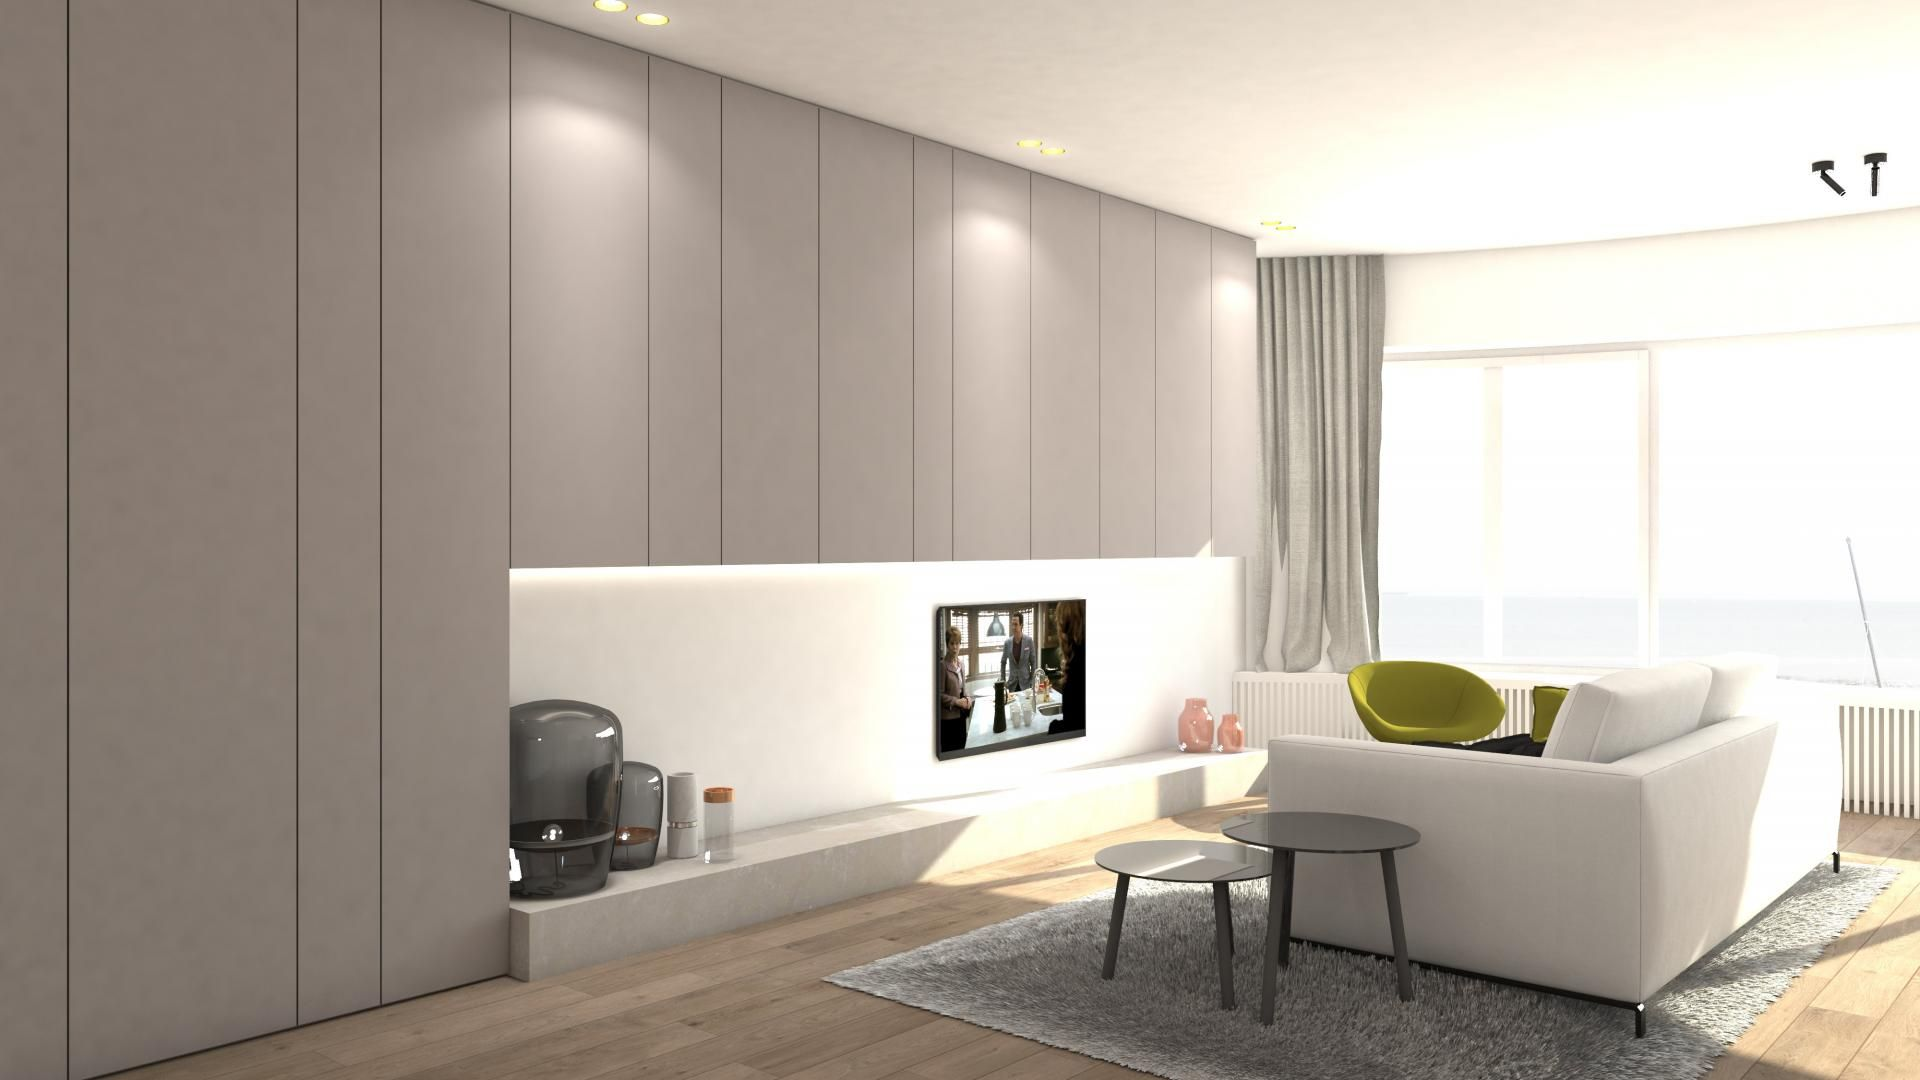 steenhuyse.com   Totaalrenovatie appartement Knokke . interieurarchitect Tielt